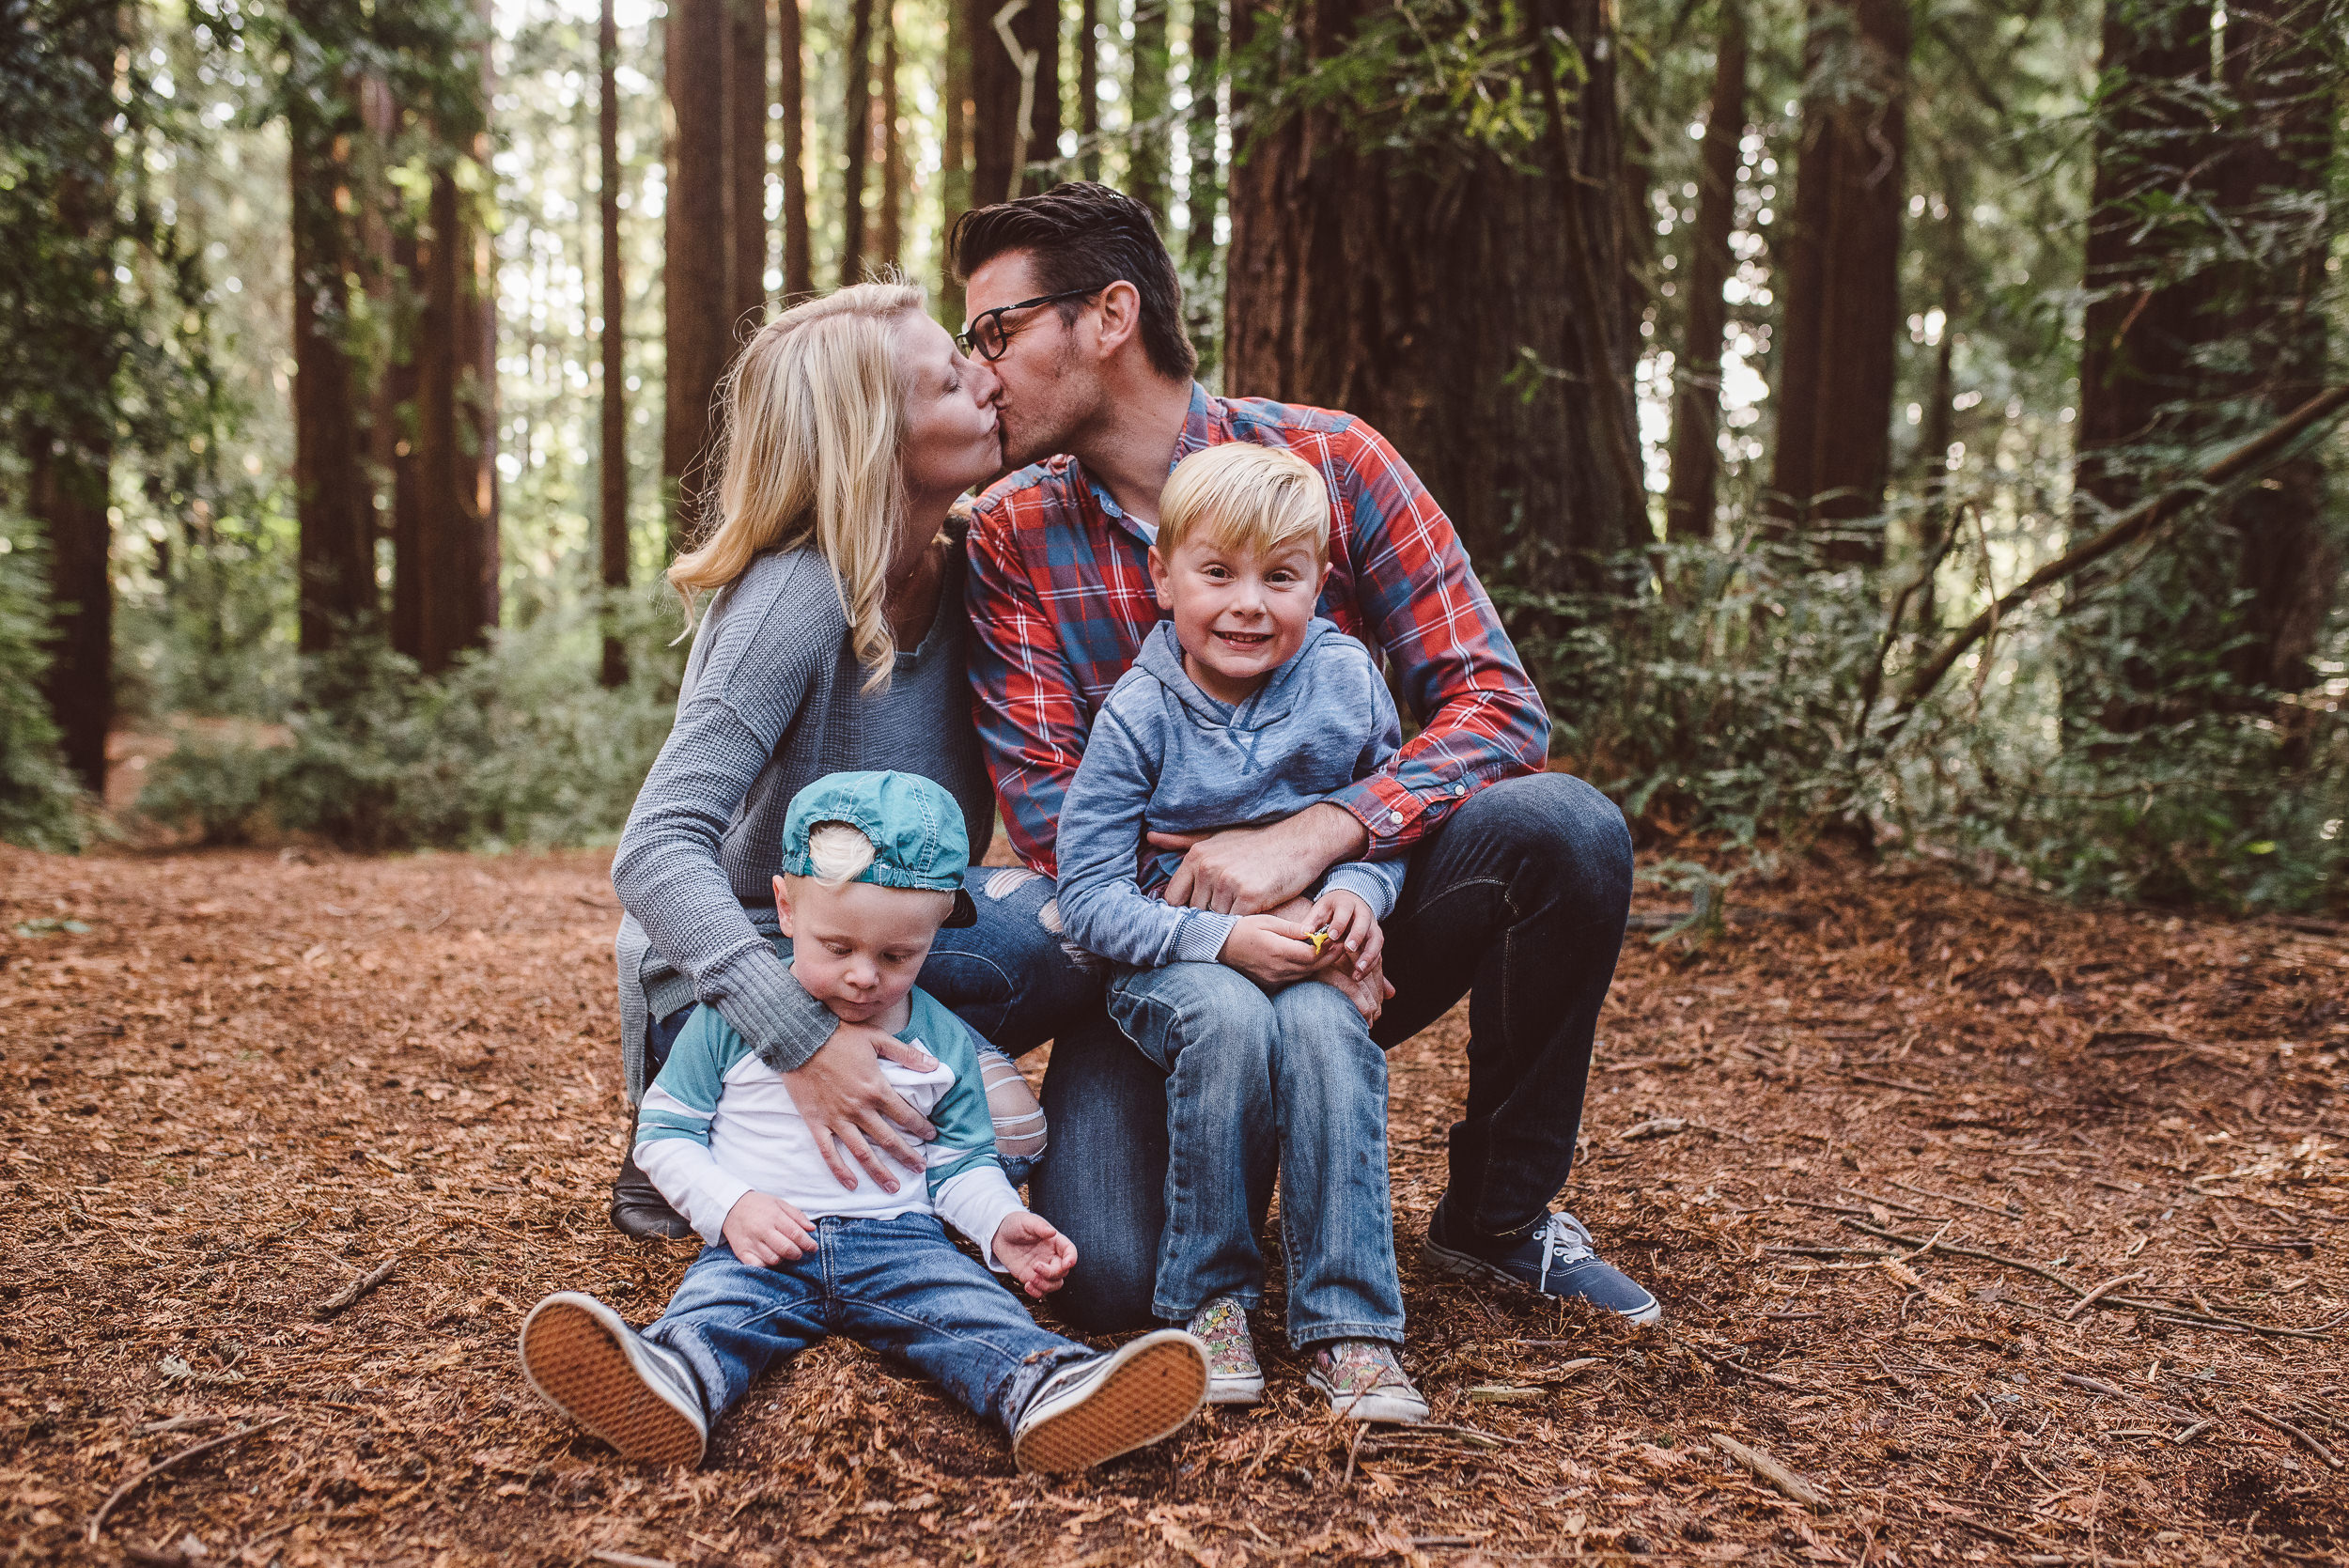 Joaquin-Miller-Park-Oakland-Family-Photography-023.jpg